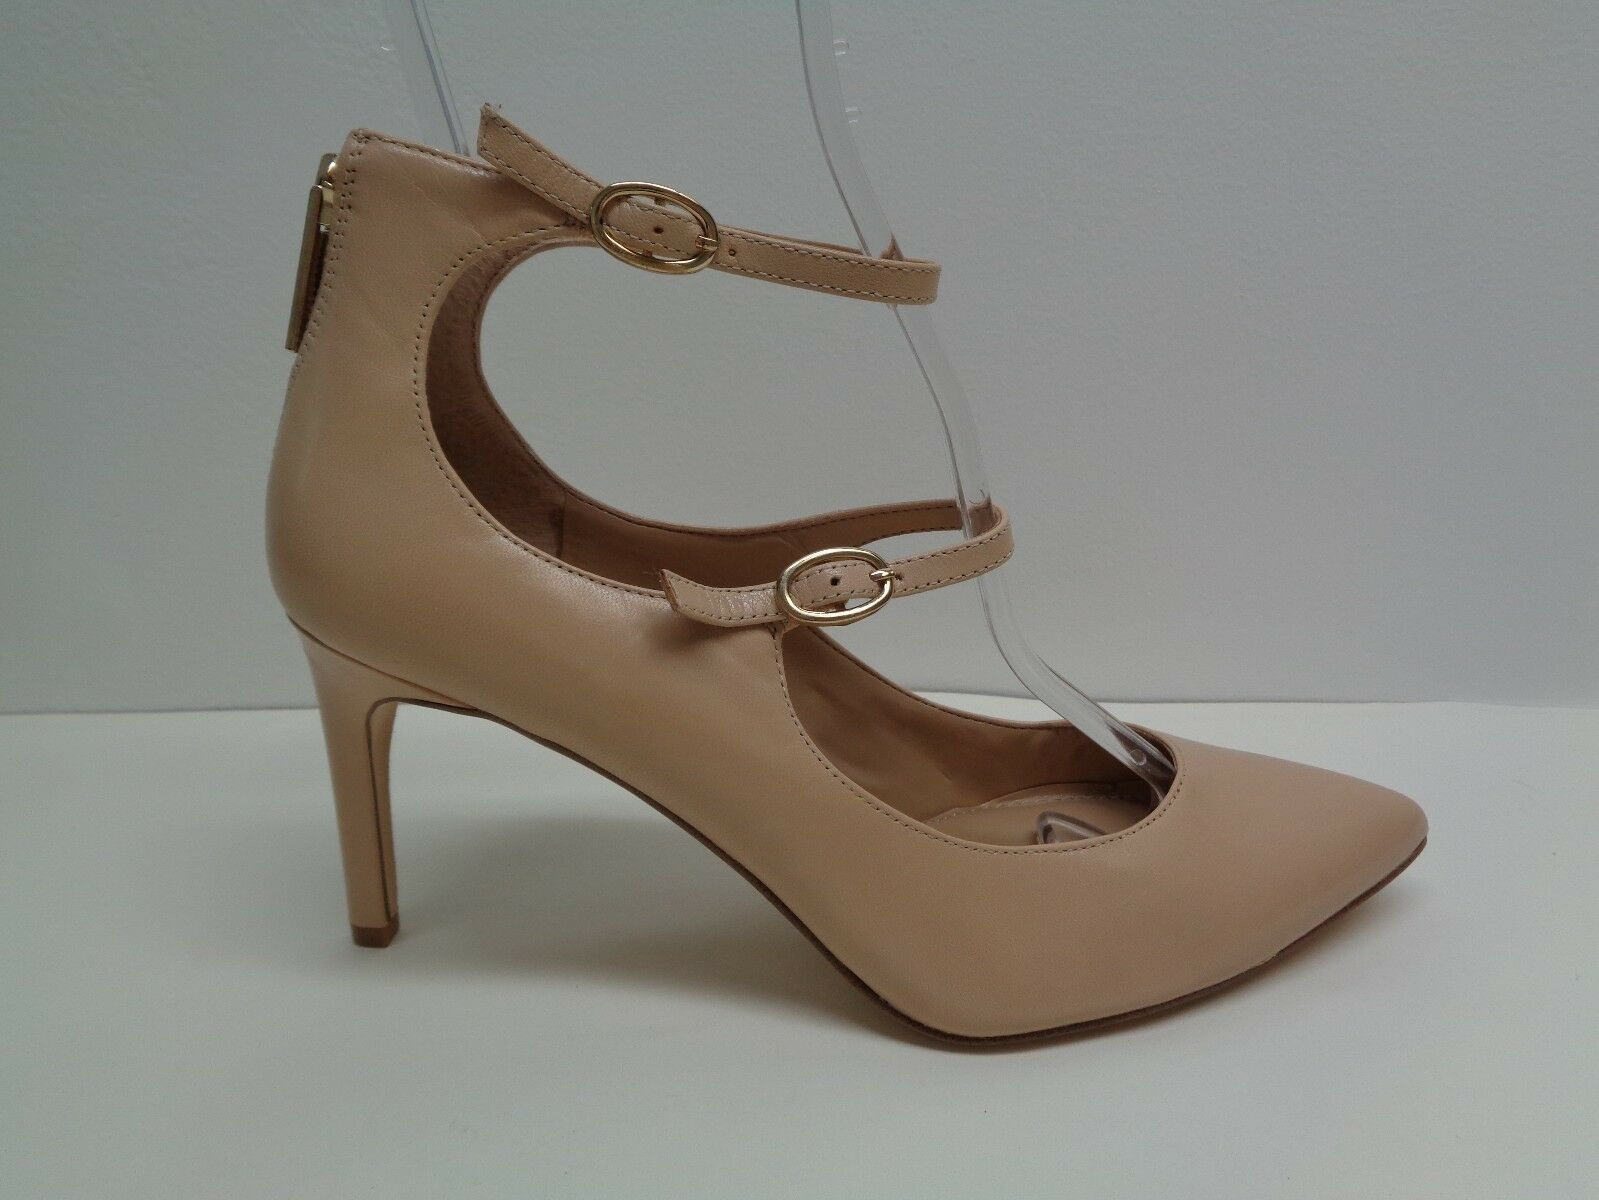 BCBG Pumps BCBGeneration Größe 9 M ZALUCA Beige Leder Heels Pumps BCBG New Damenschuhe Schuhes faf0d4